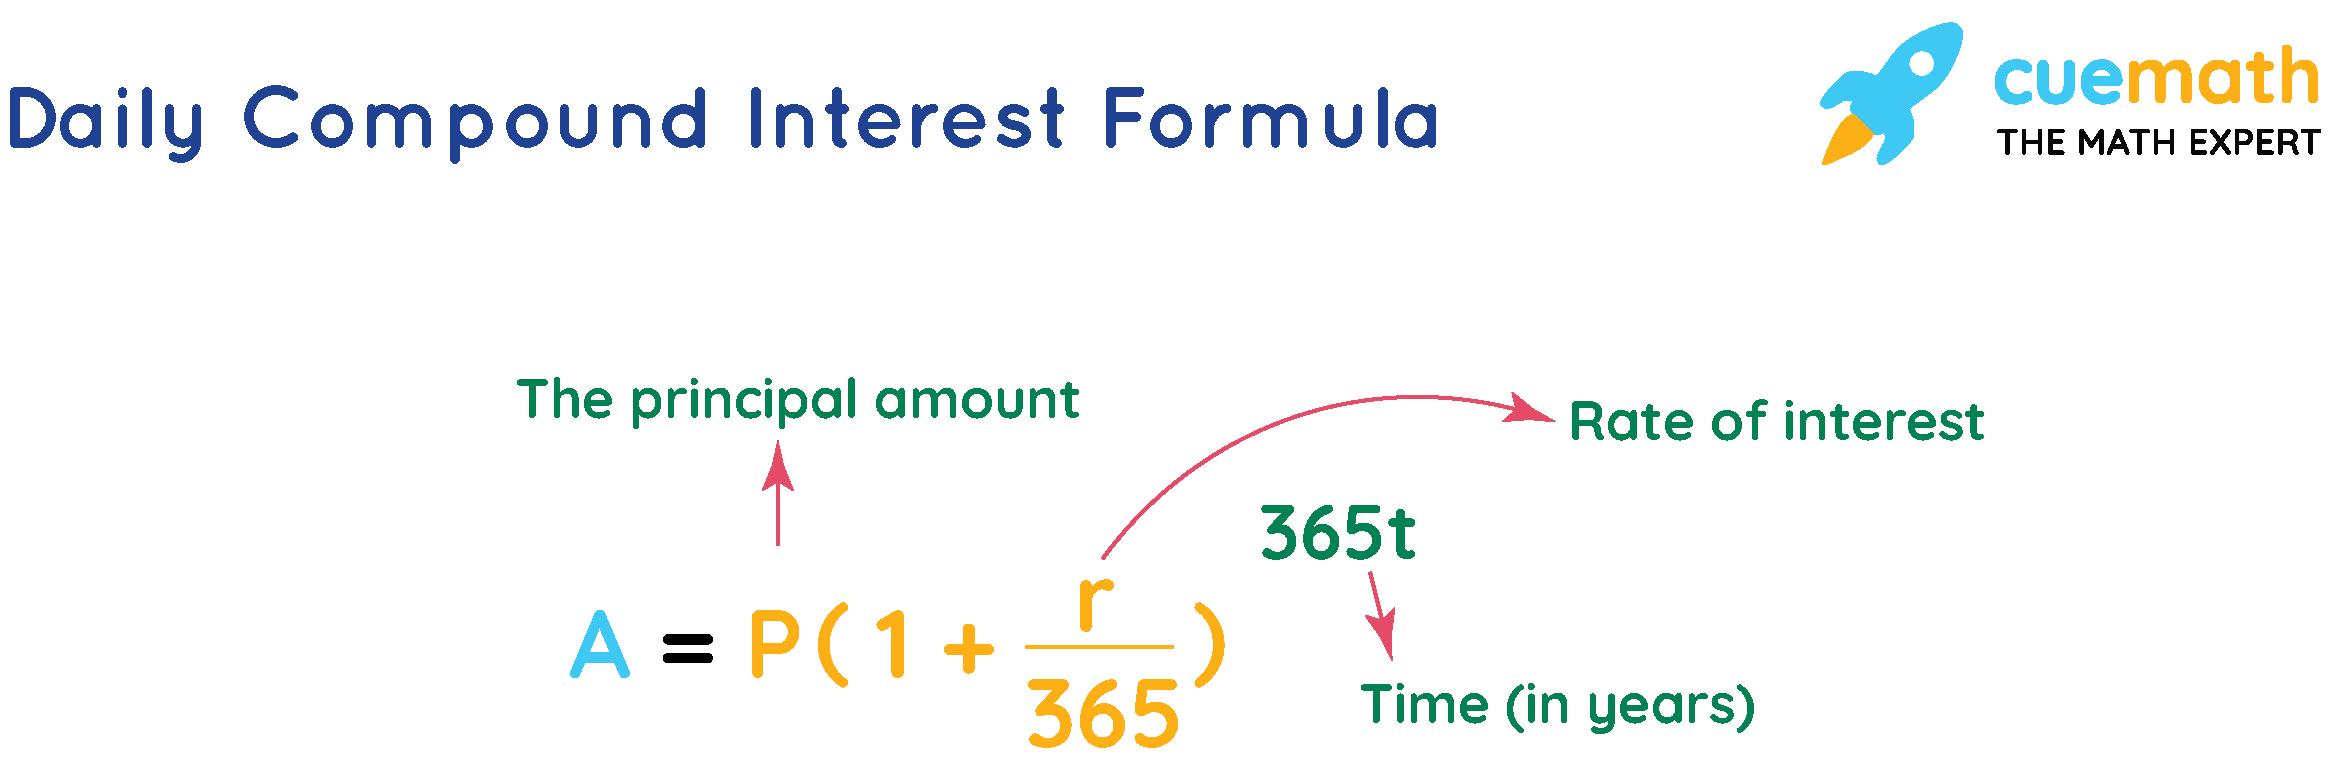 daily compound interest formula